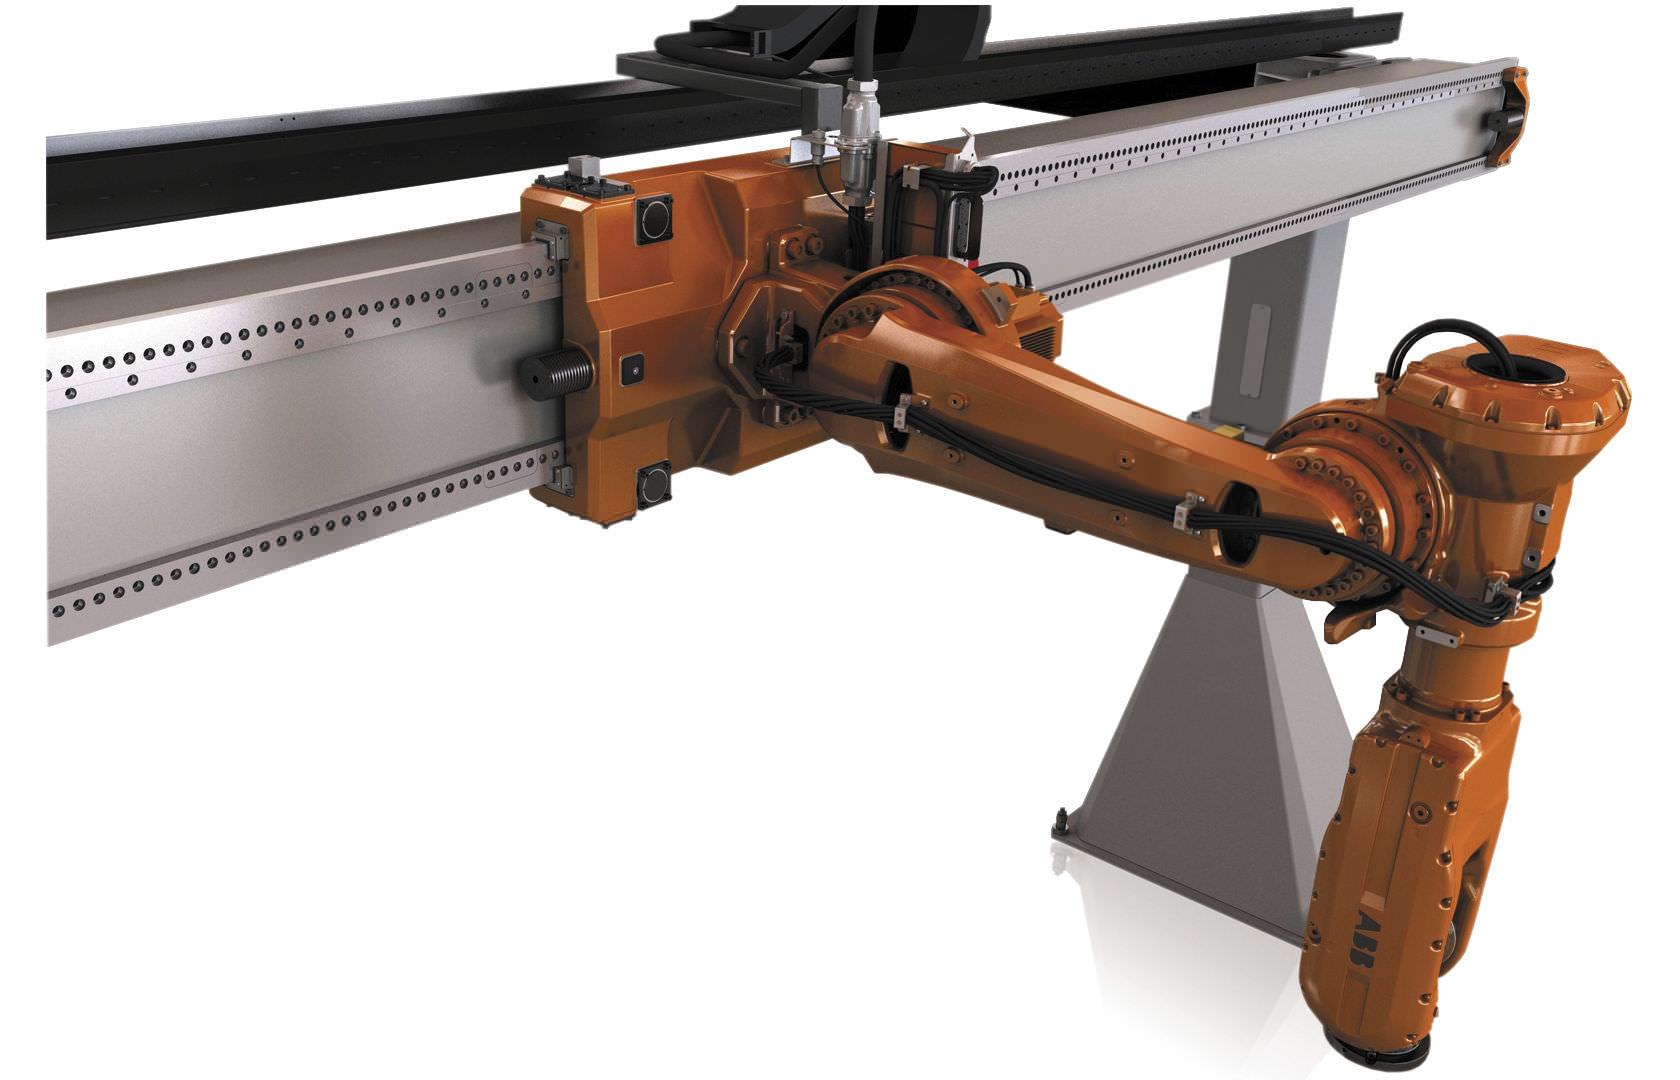 Промышленный робот ABB IRB 6620LX